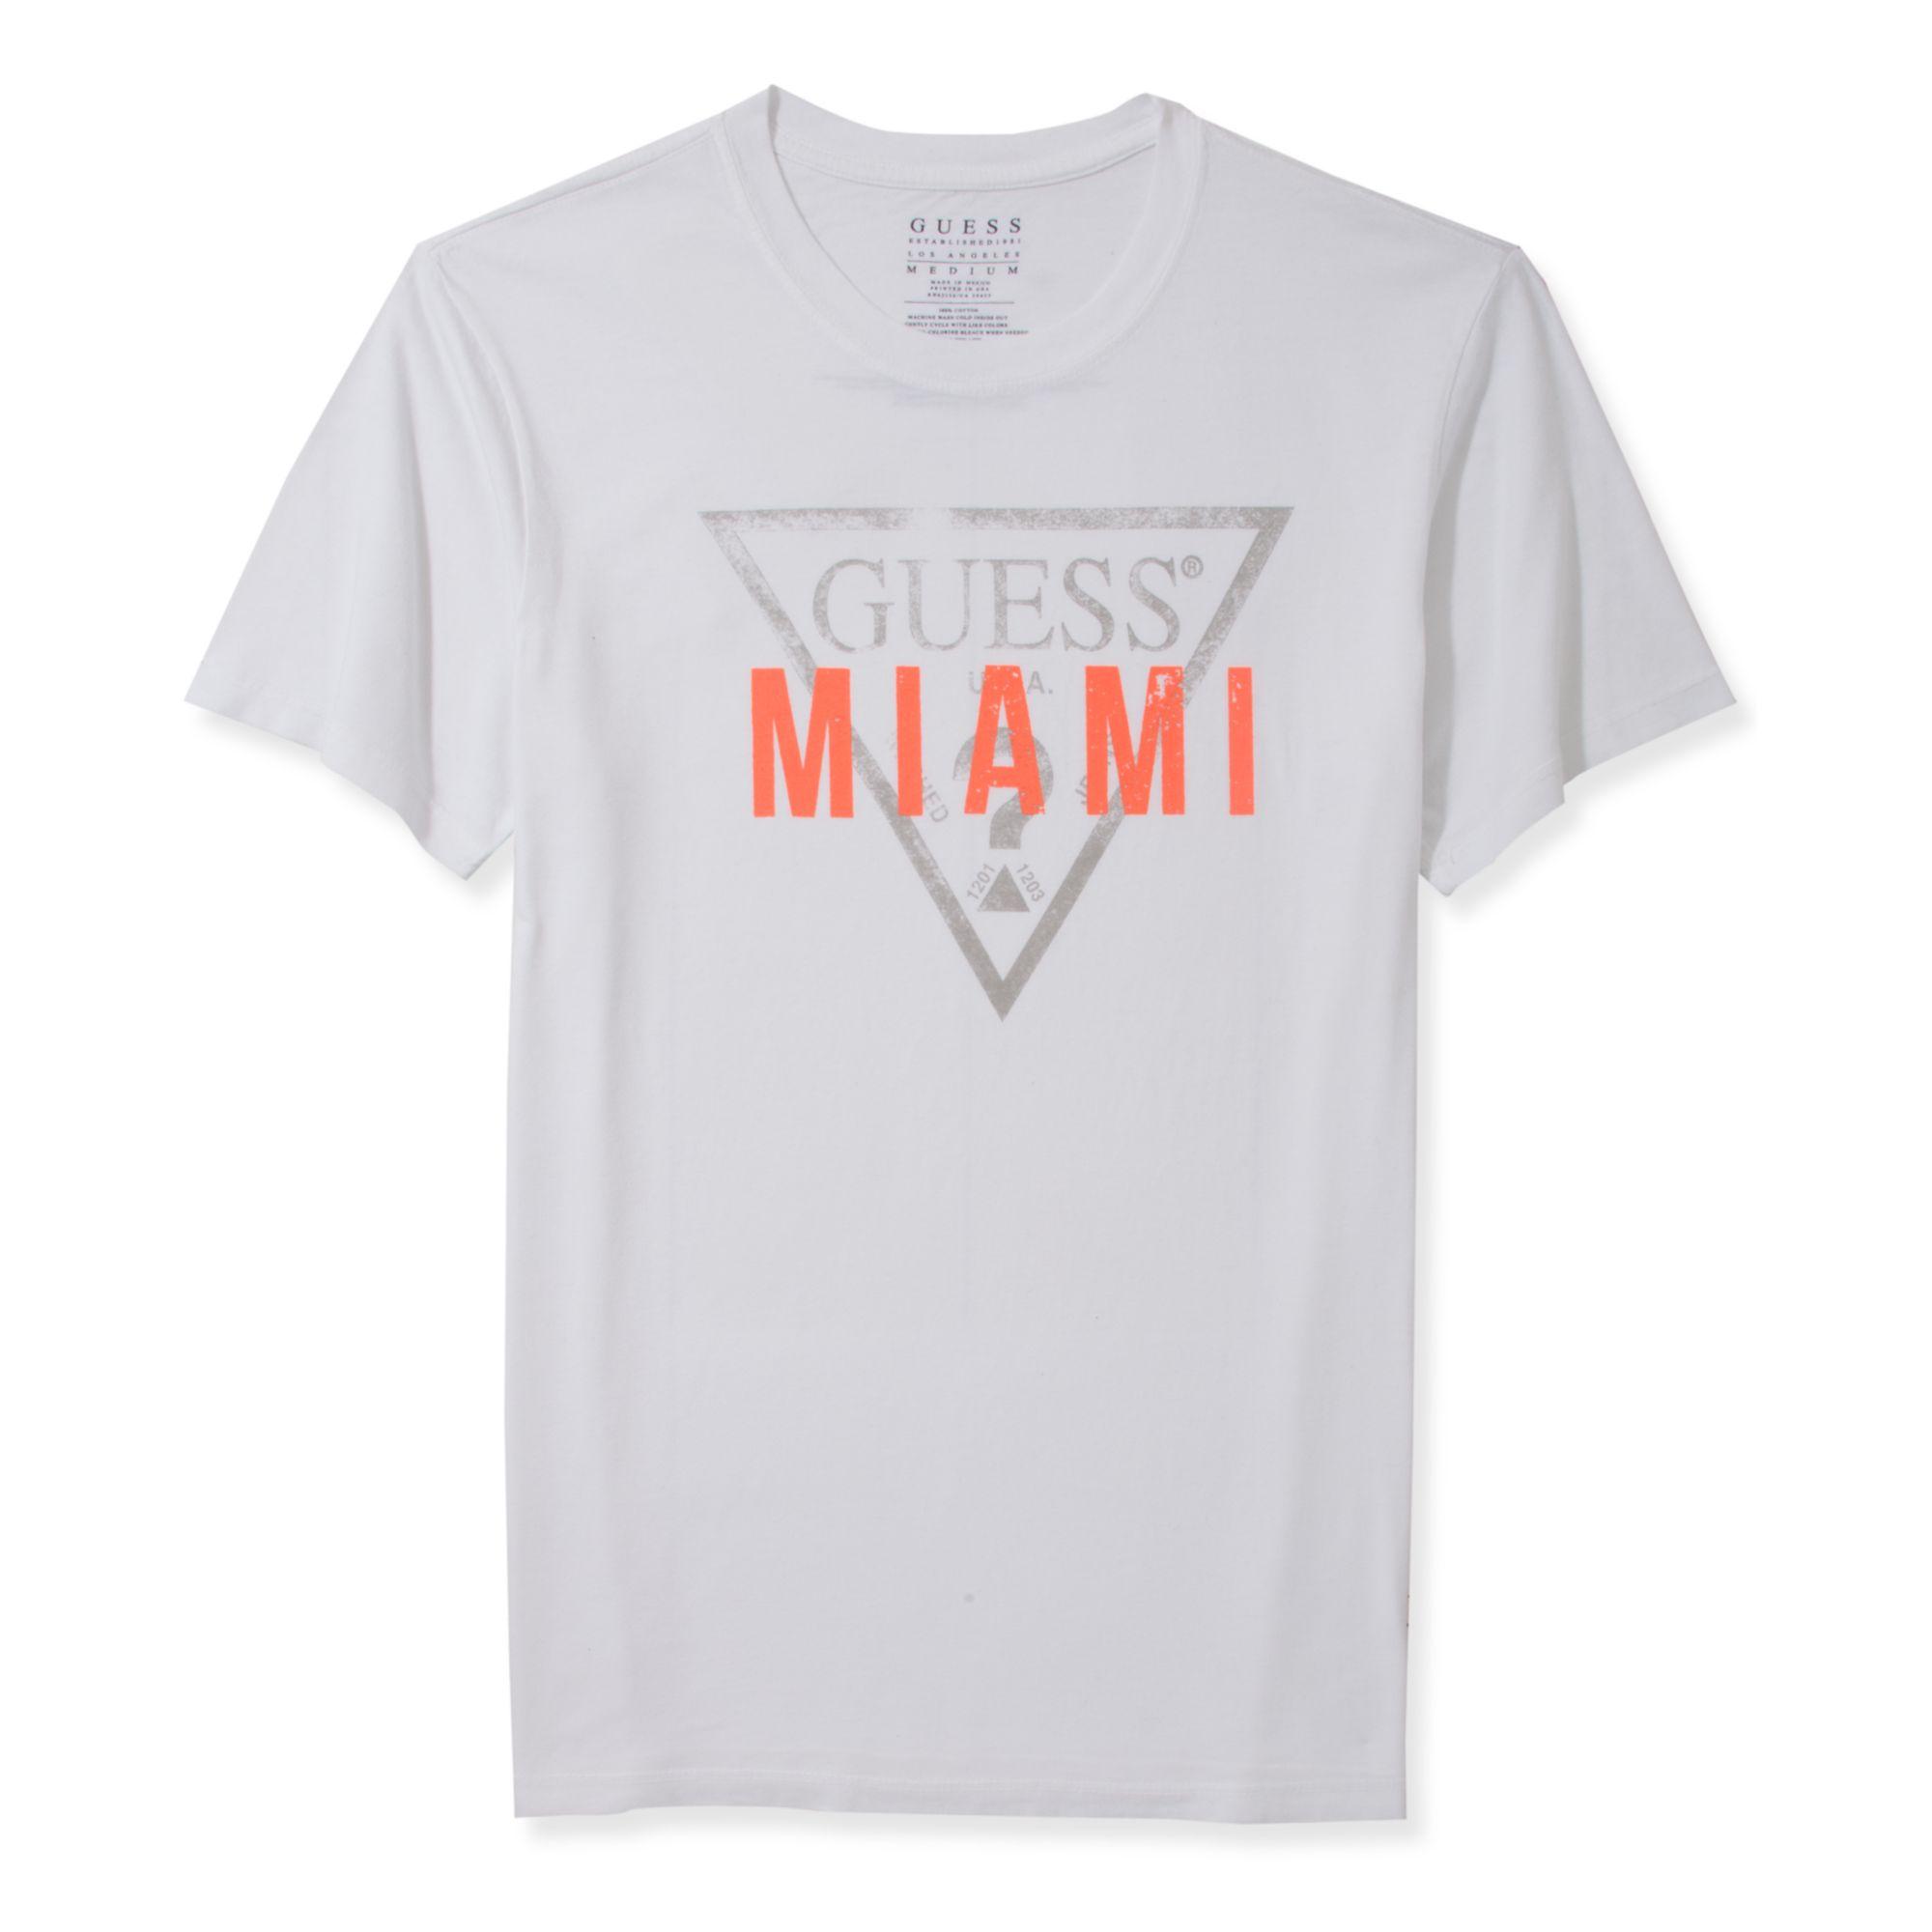 guess shirt destination miami logo tshirt in white for men. Black Bedroom Furniture Sets. Home Design Ideas